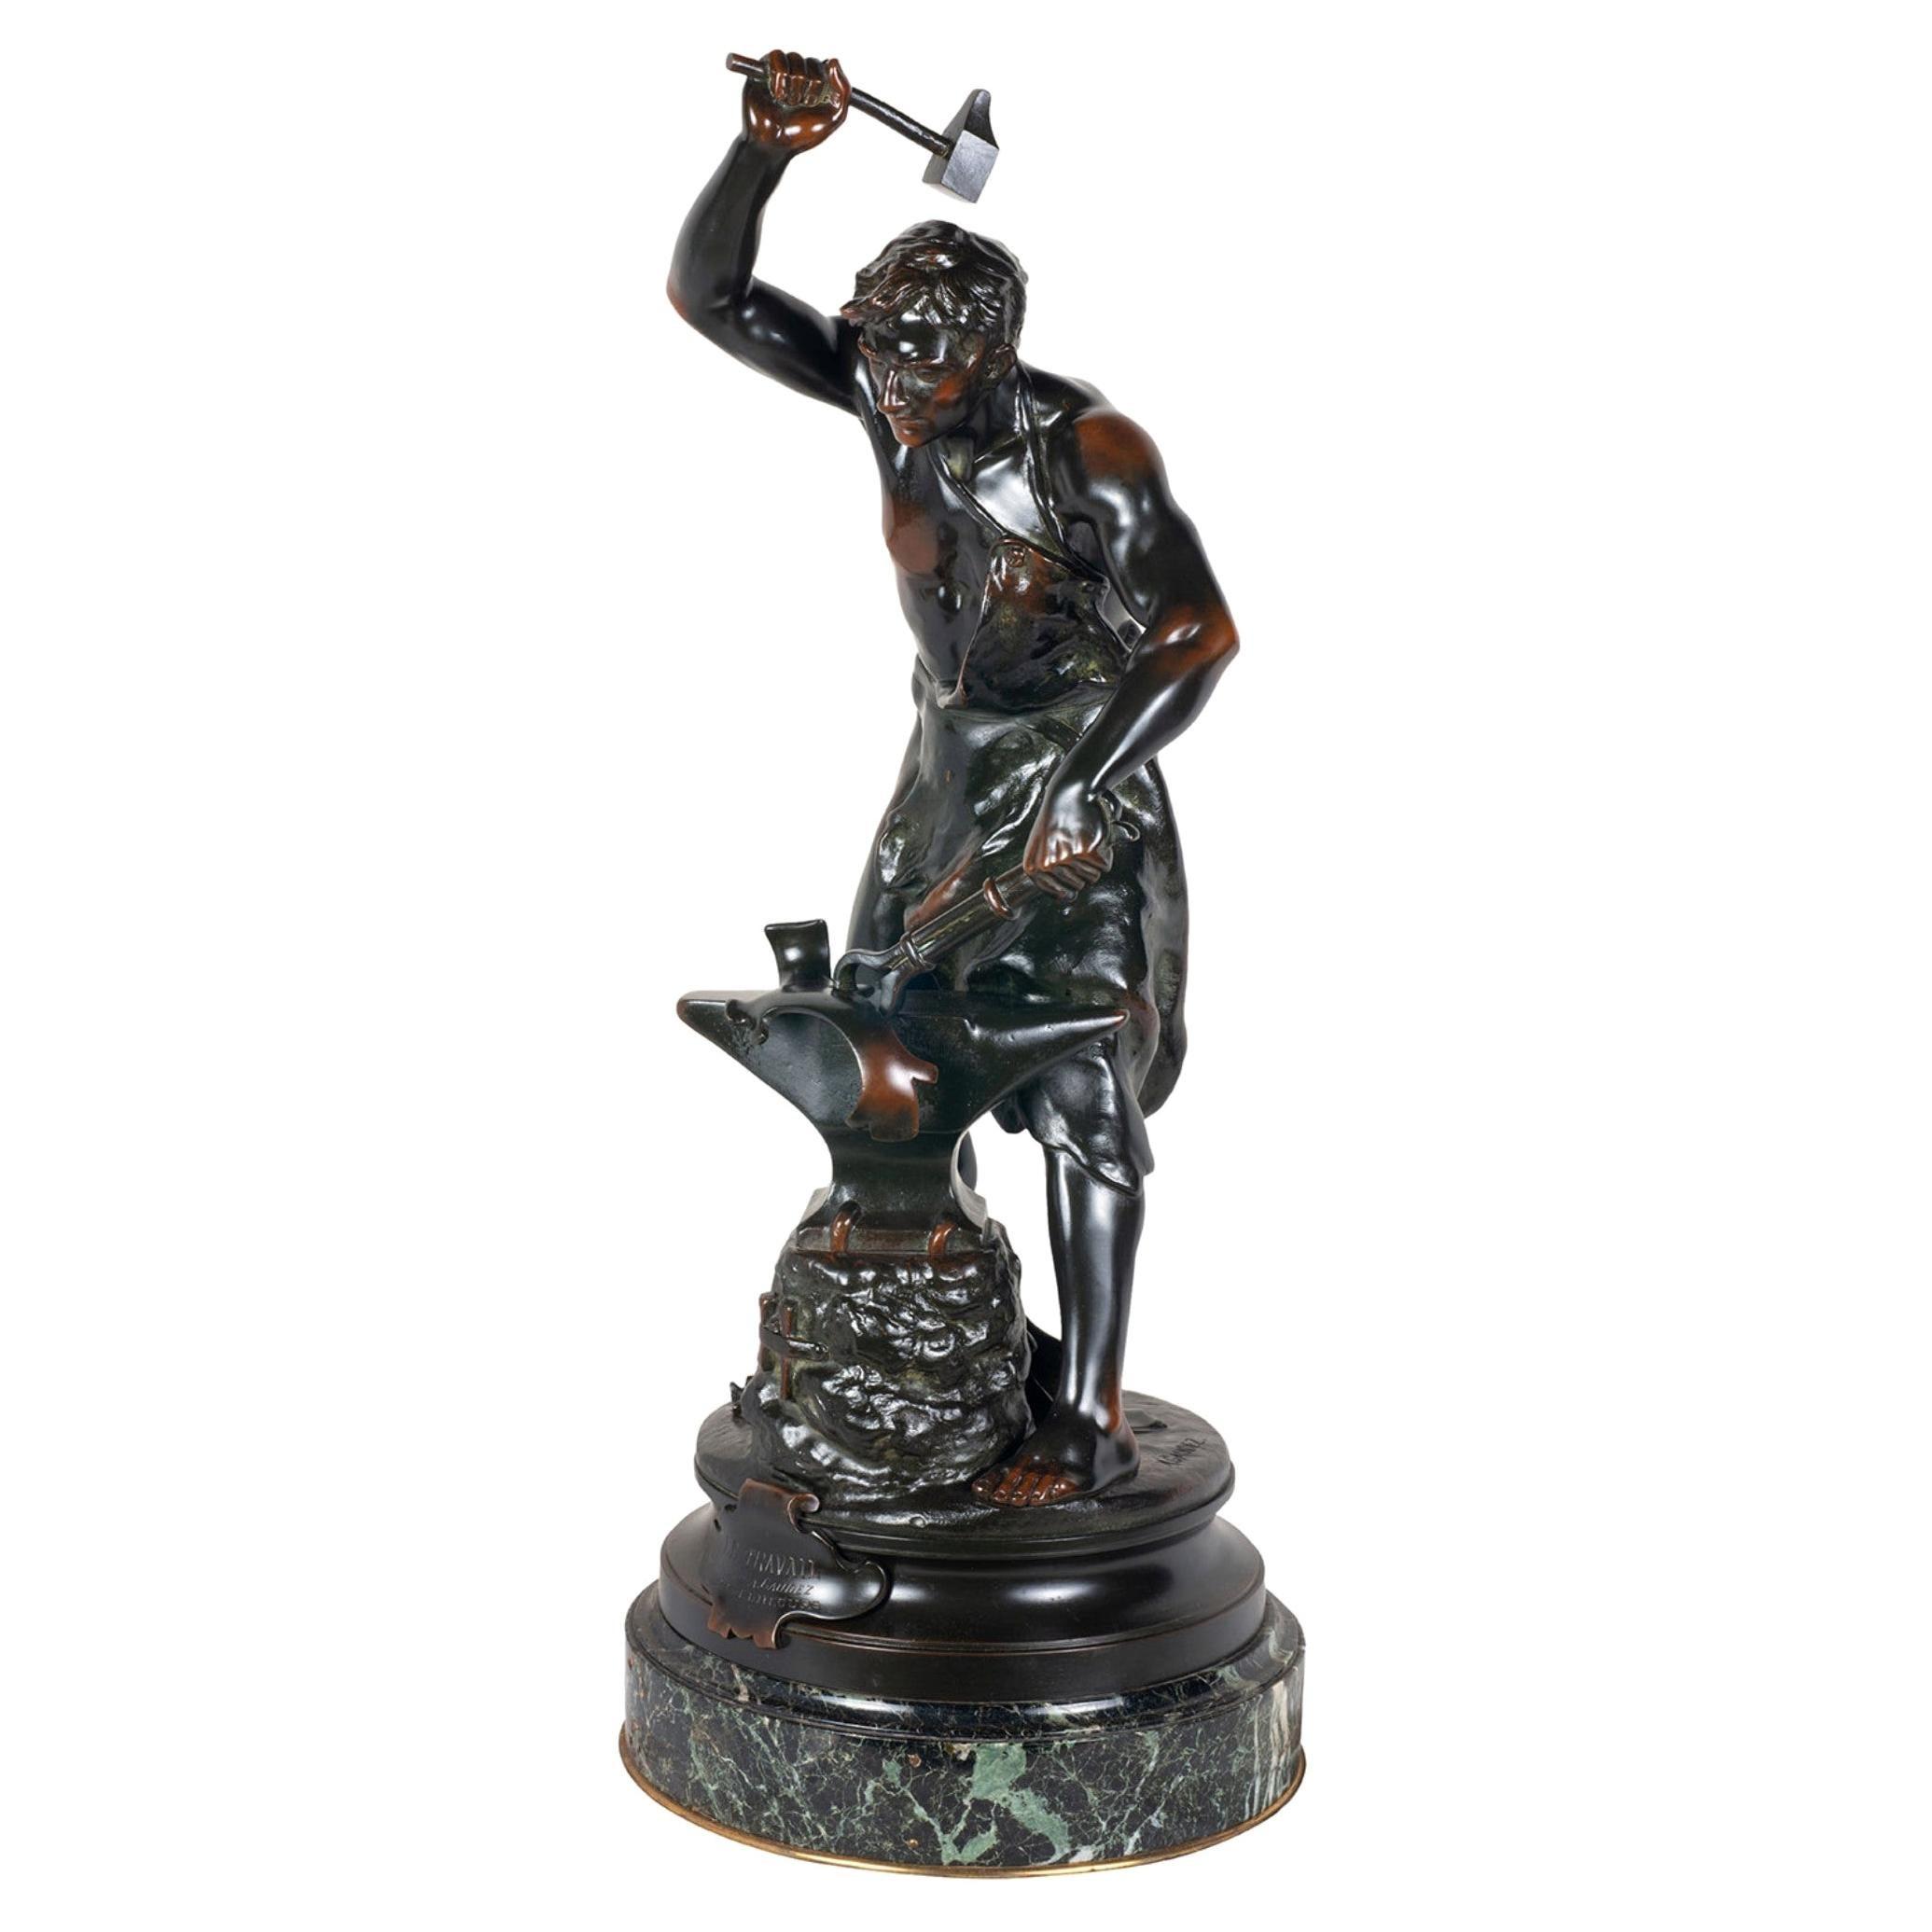 19th Century Bronze Statue of a Blacksmith, Signed Gaudez